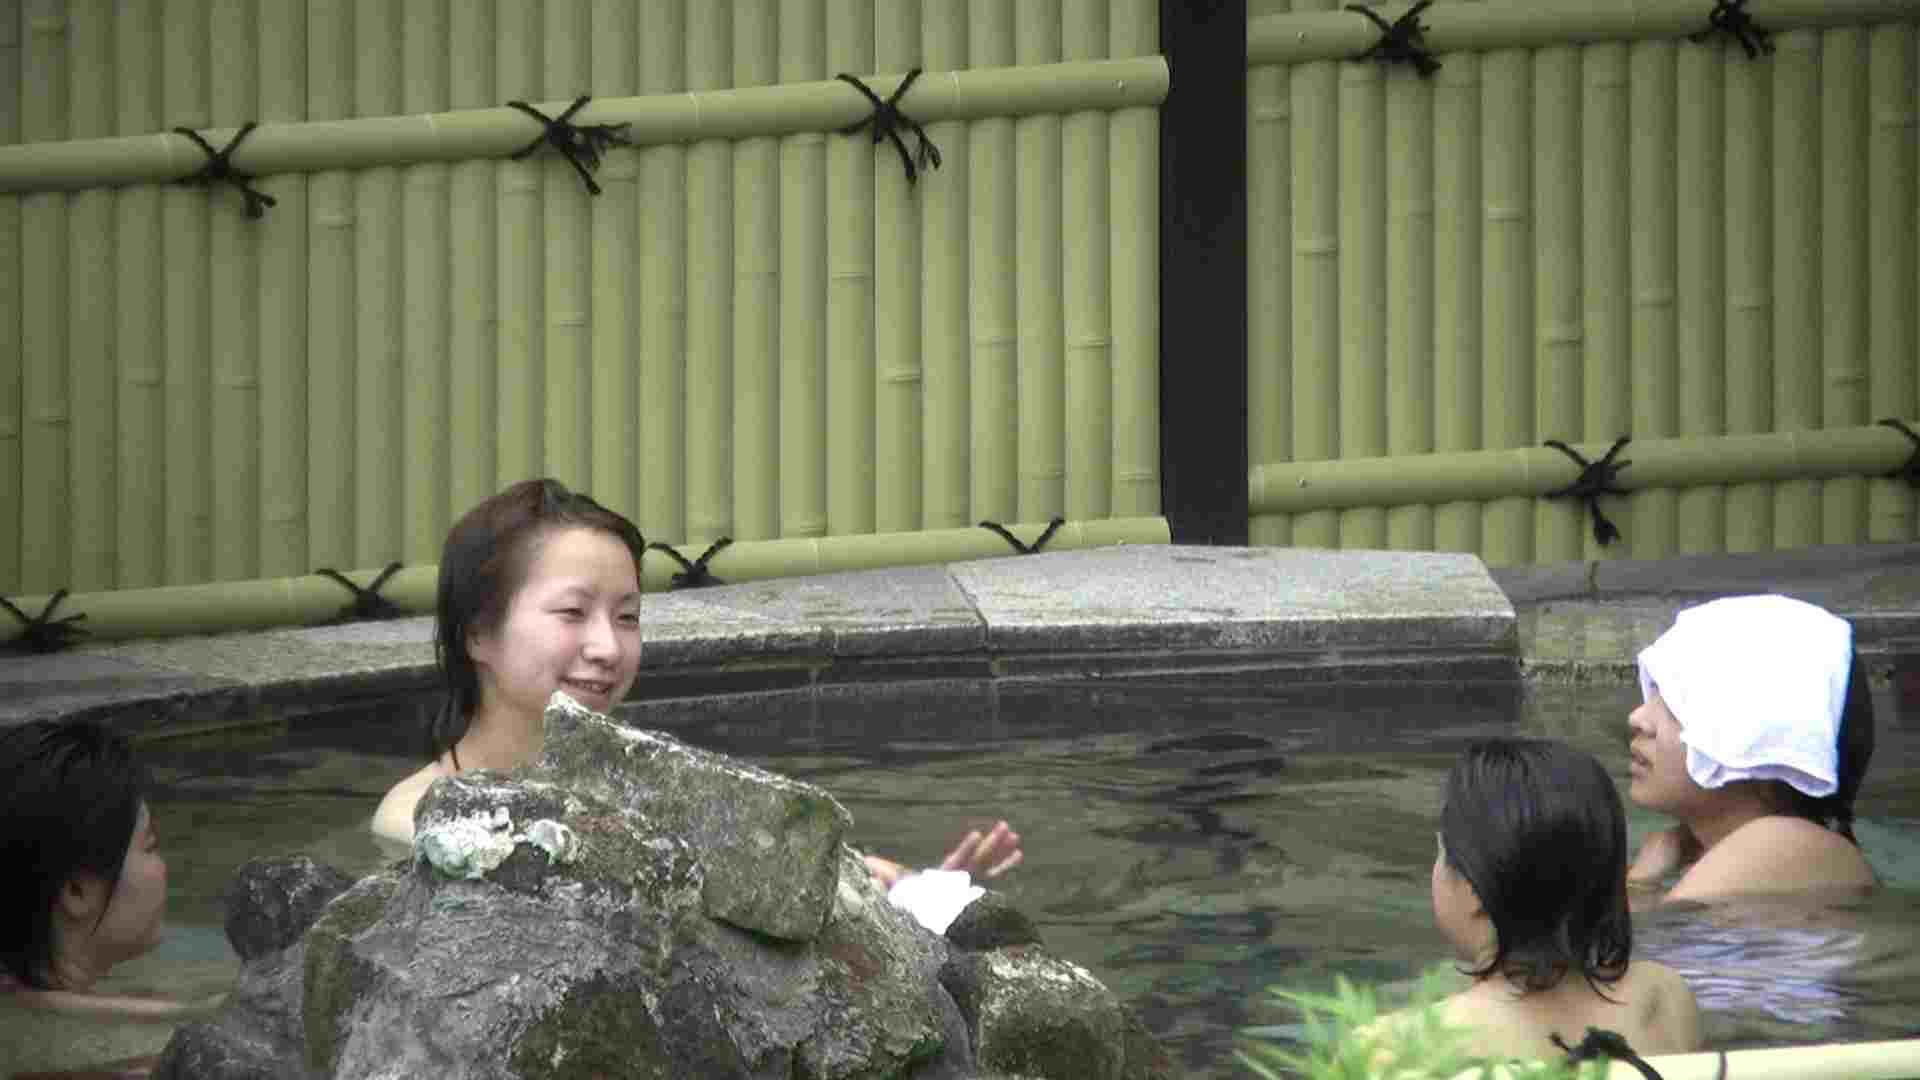 Aquaな露天風呂Vol.181 盗撮 セックス画像 40連発 14